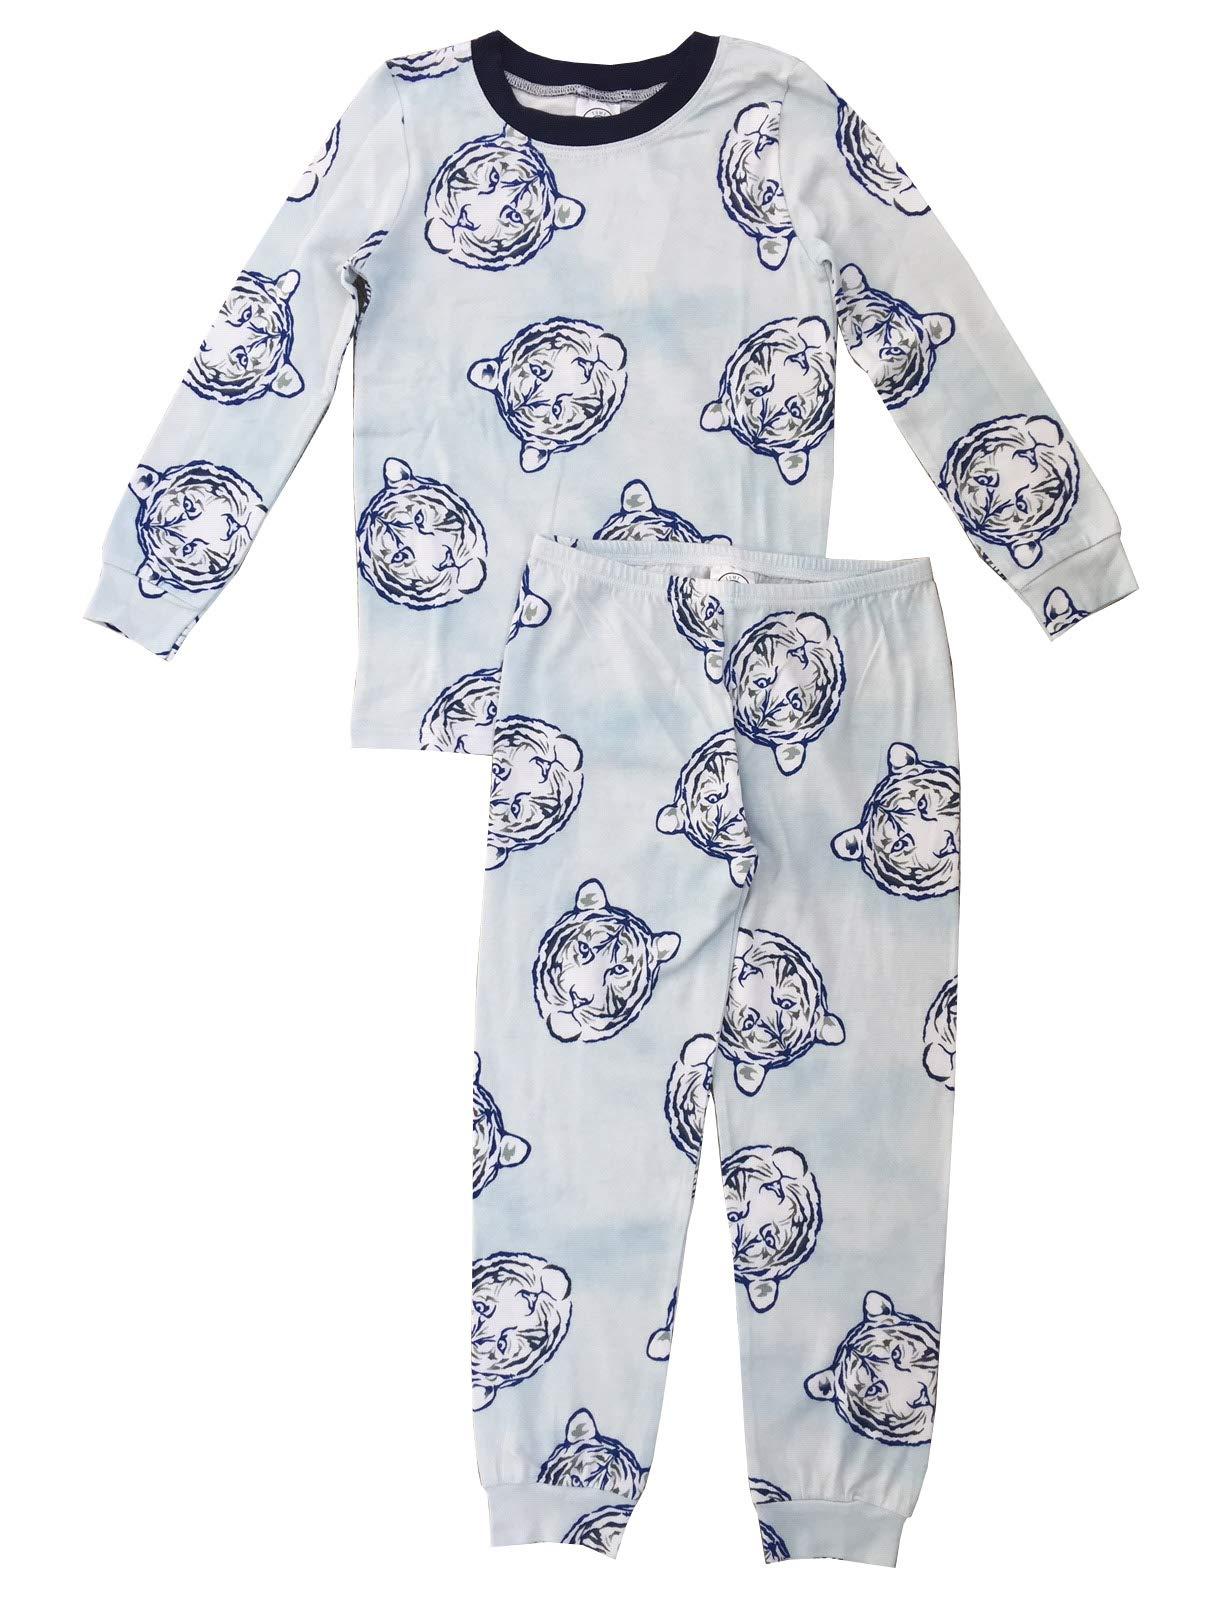 Esme Boys Pajamas Crew Neck Long Sleeve Pant Set 6 Tiger